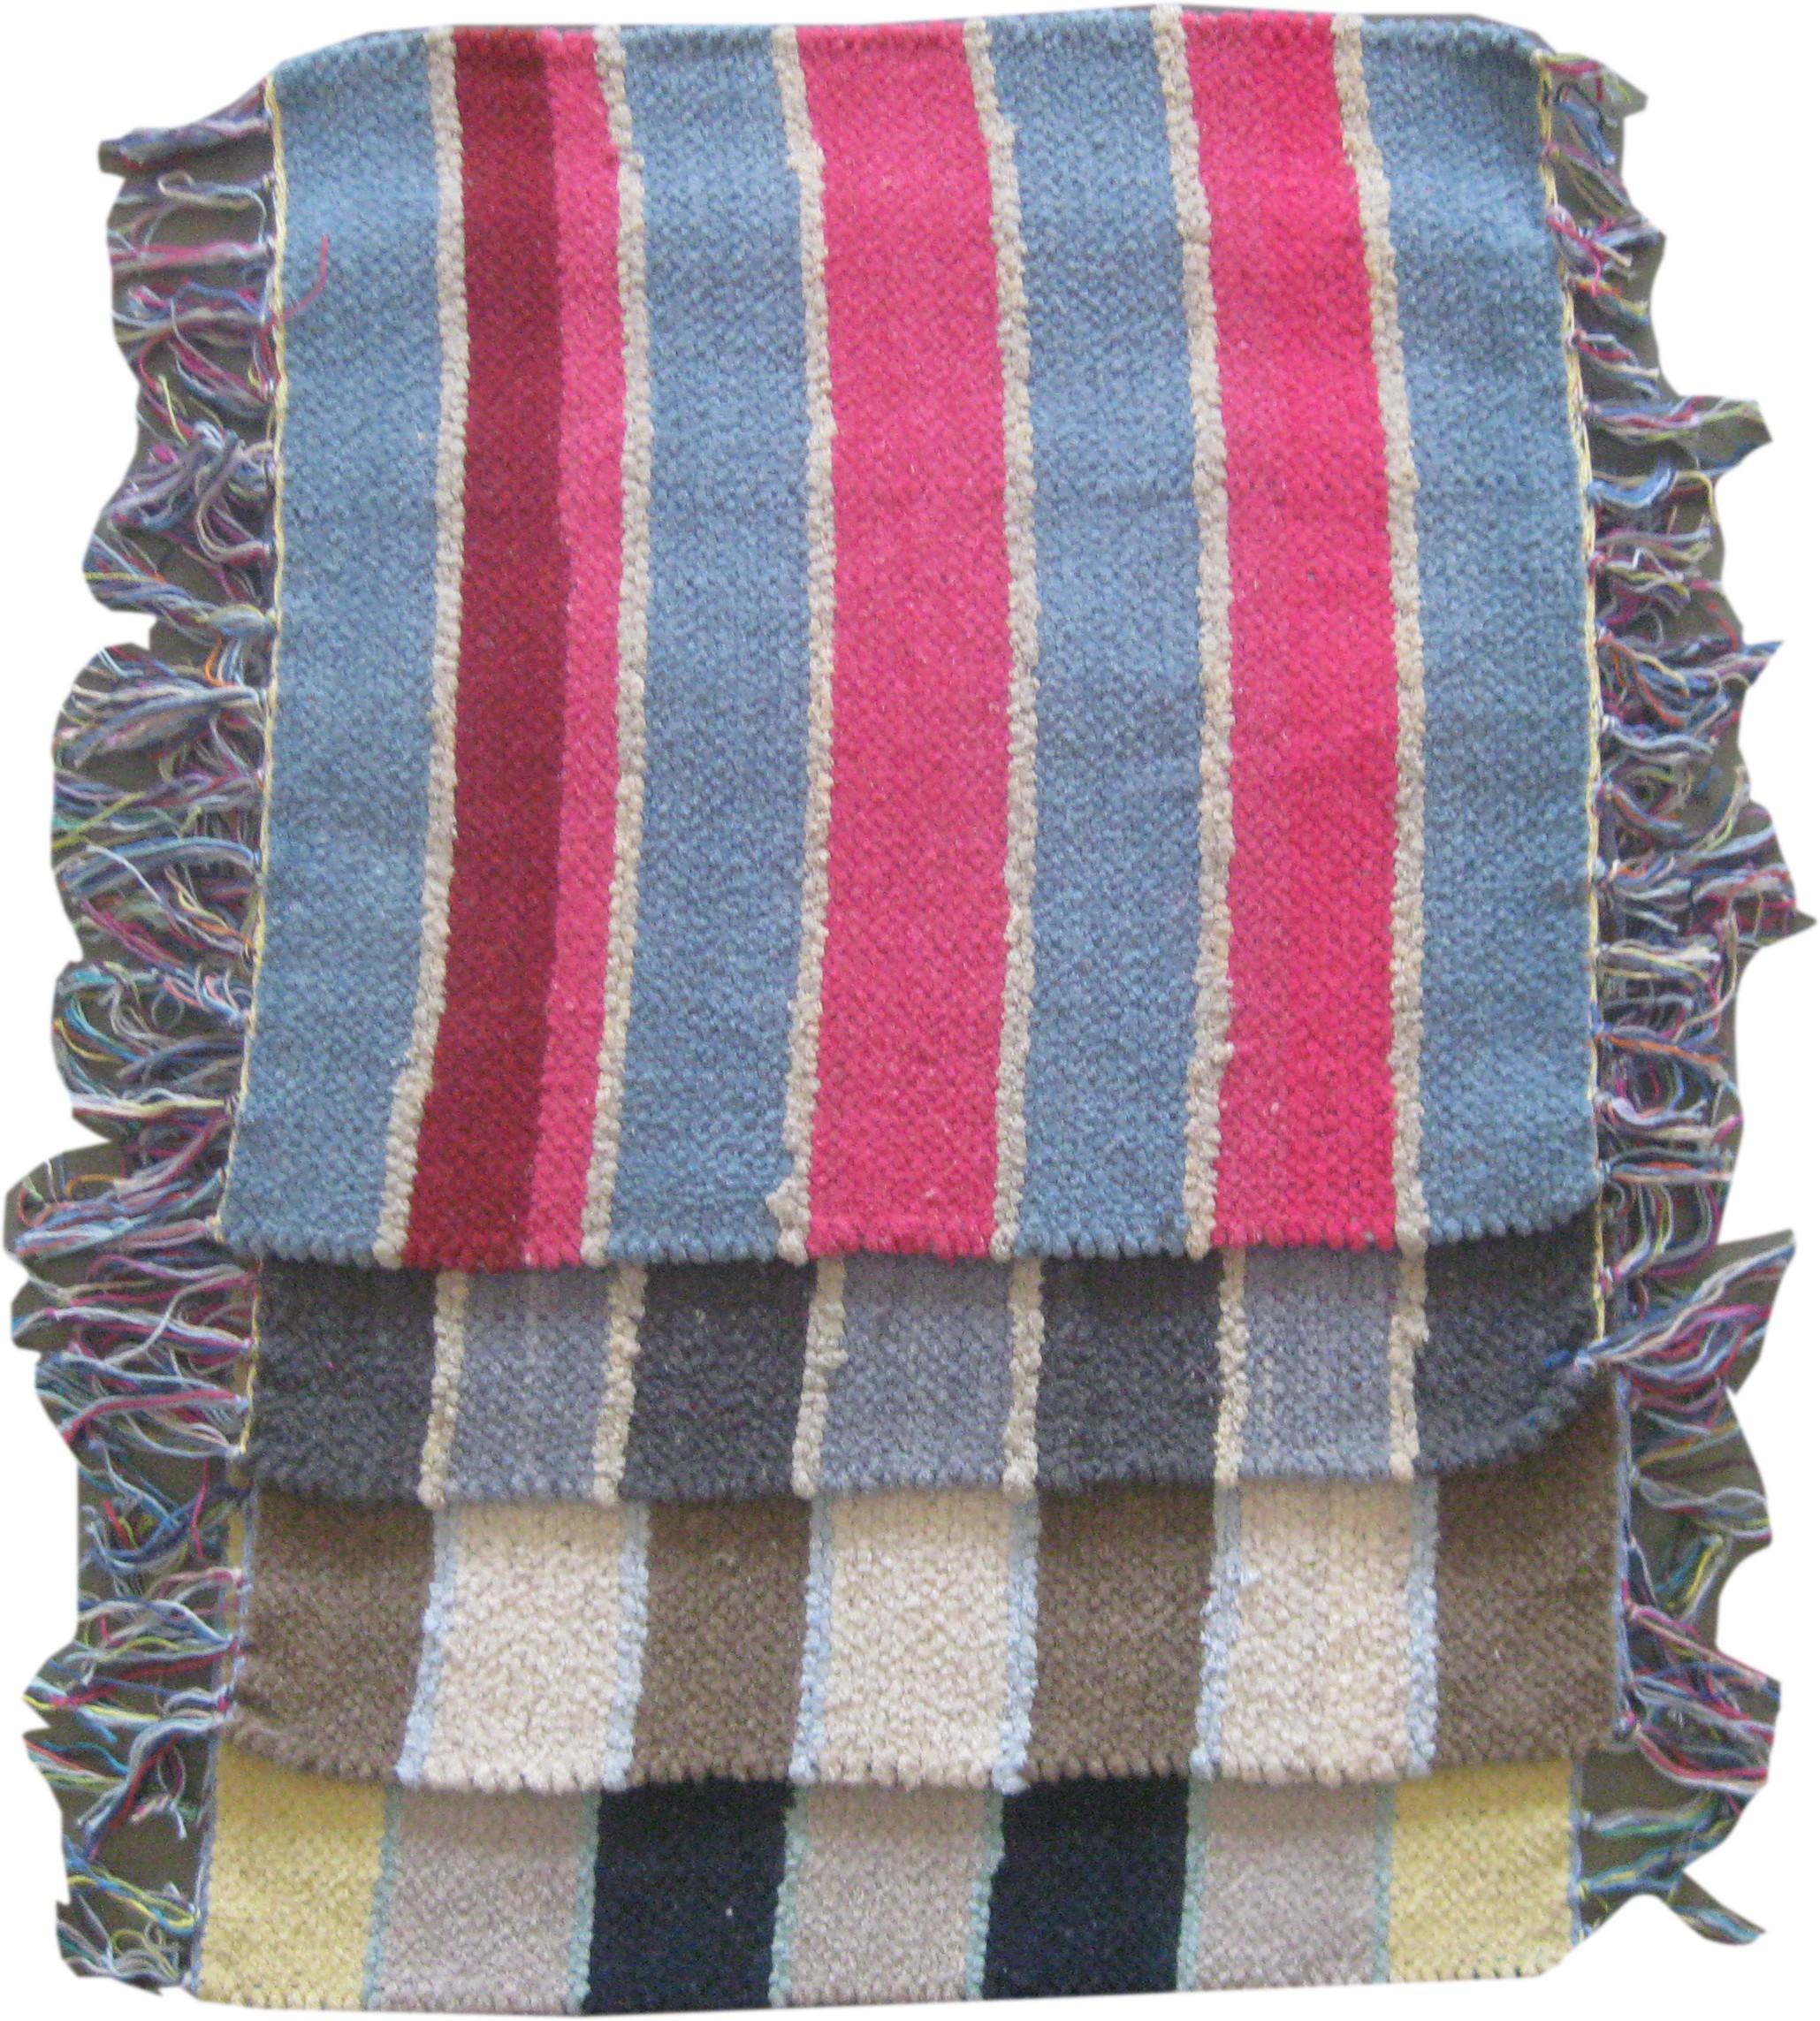 Krishna Carpets Cotton Medium Prayer Mat Striped Mats